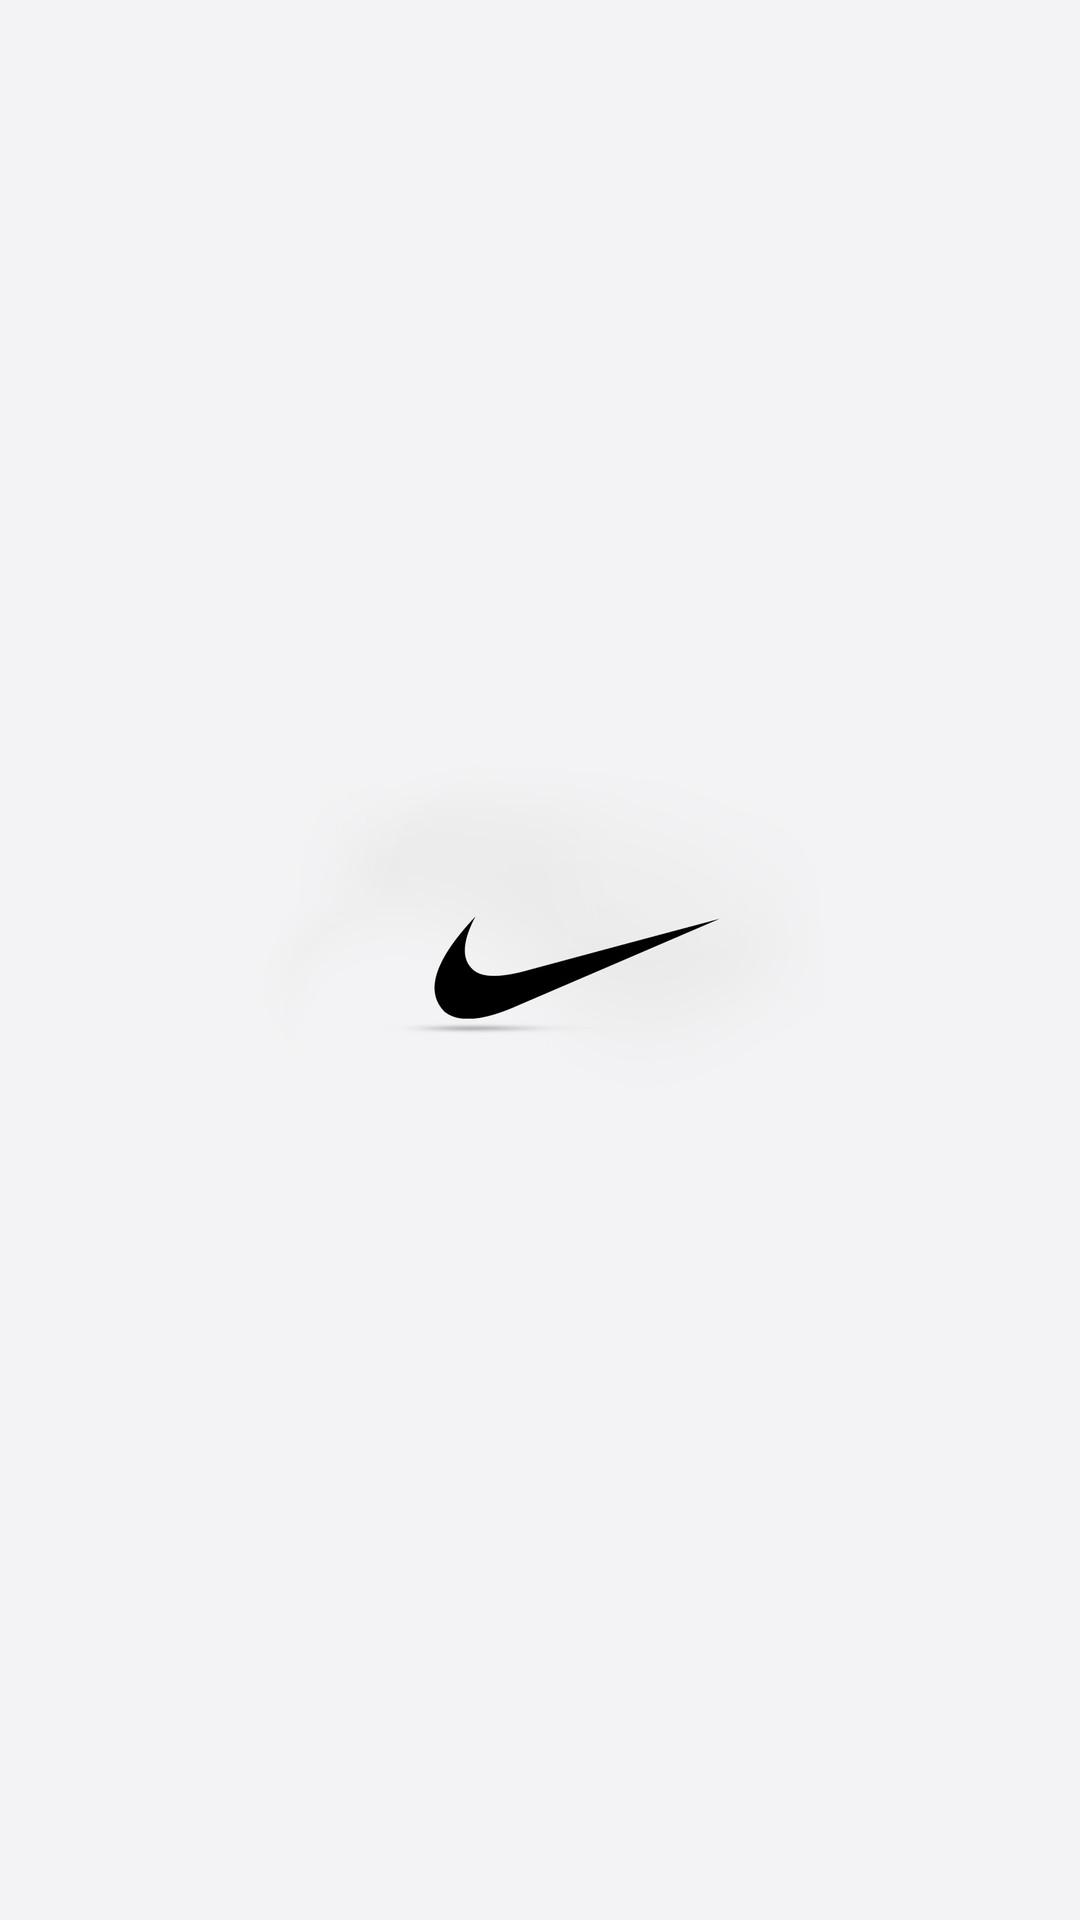 Black Nike Wallpaper Wallpapertag